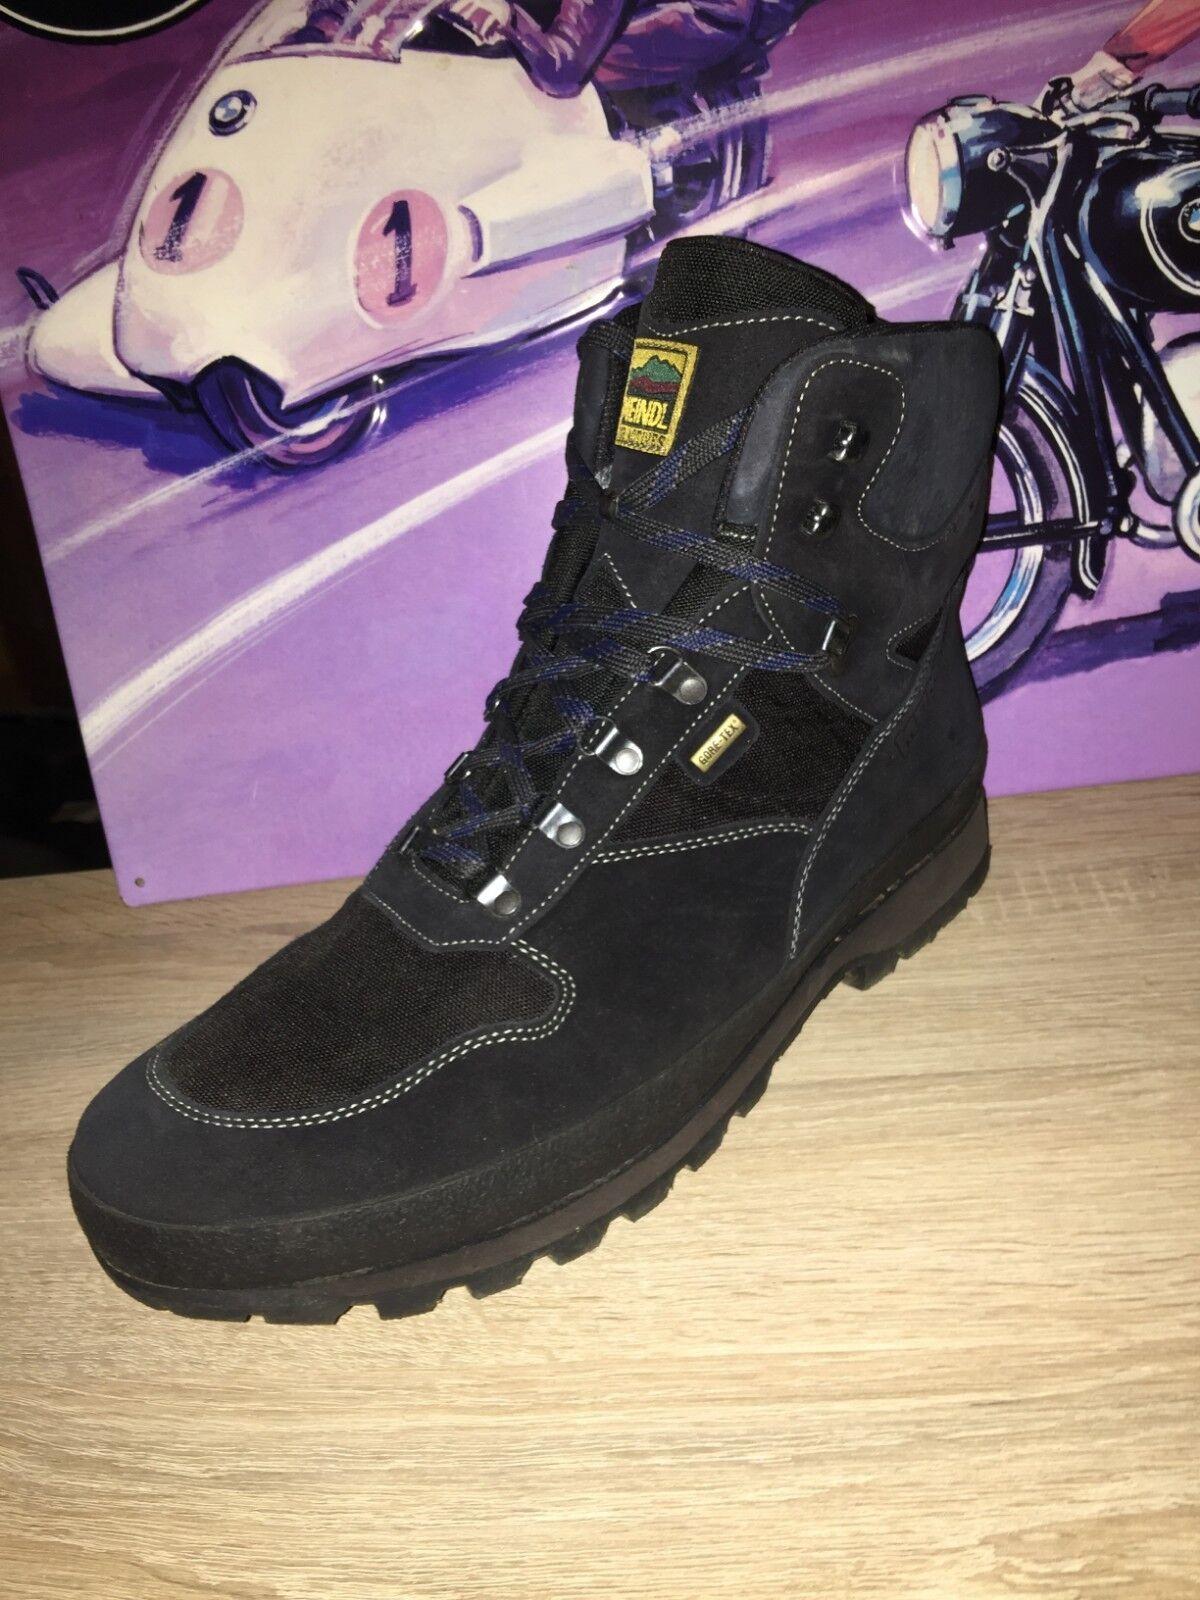 Meindl For For For Actives Wanderstiefel Schuhe Gr. 46 Vibram Gore-Tex 86d058